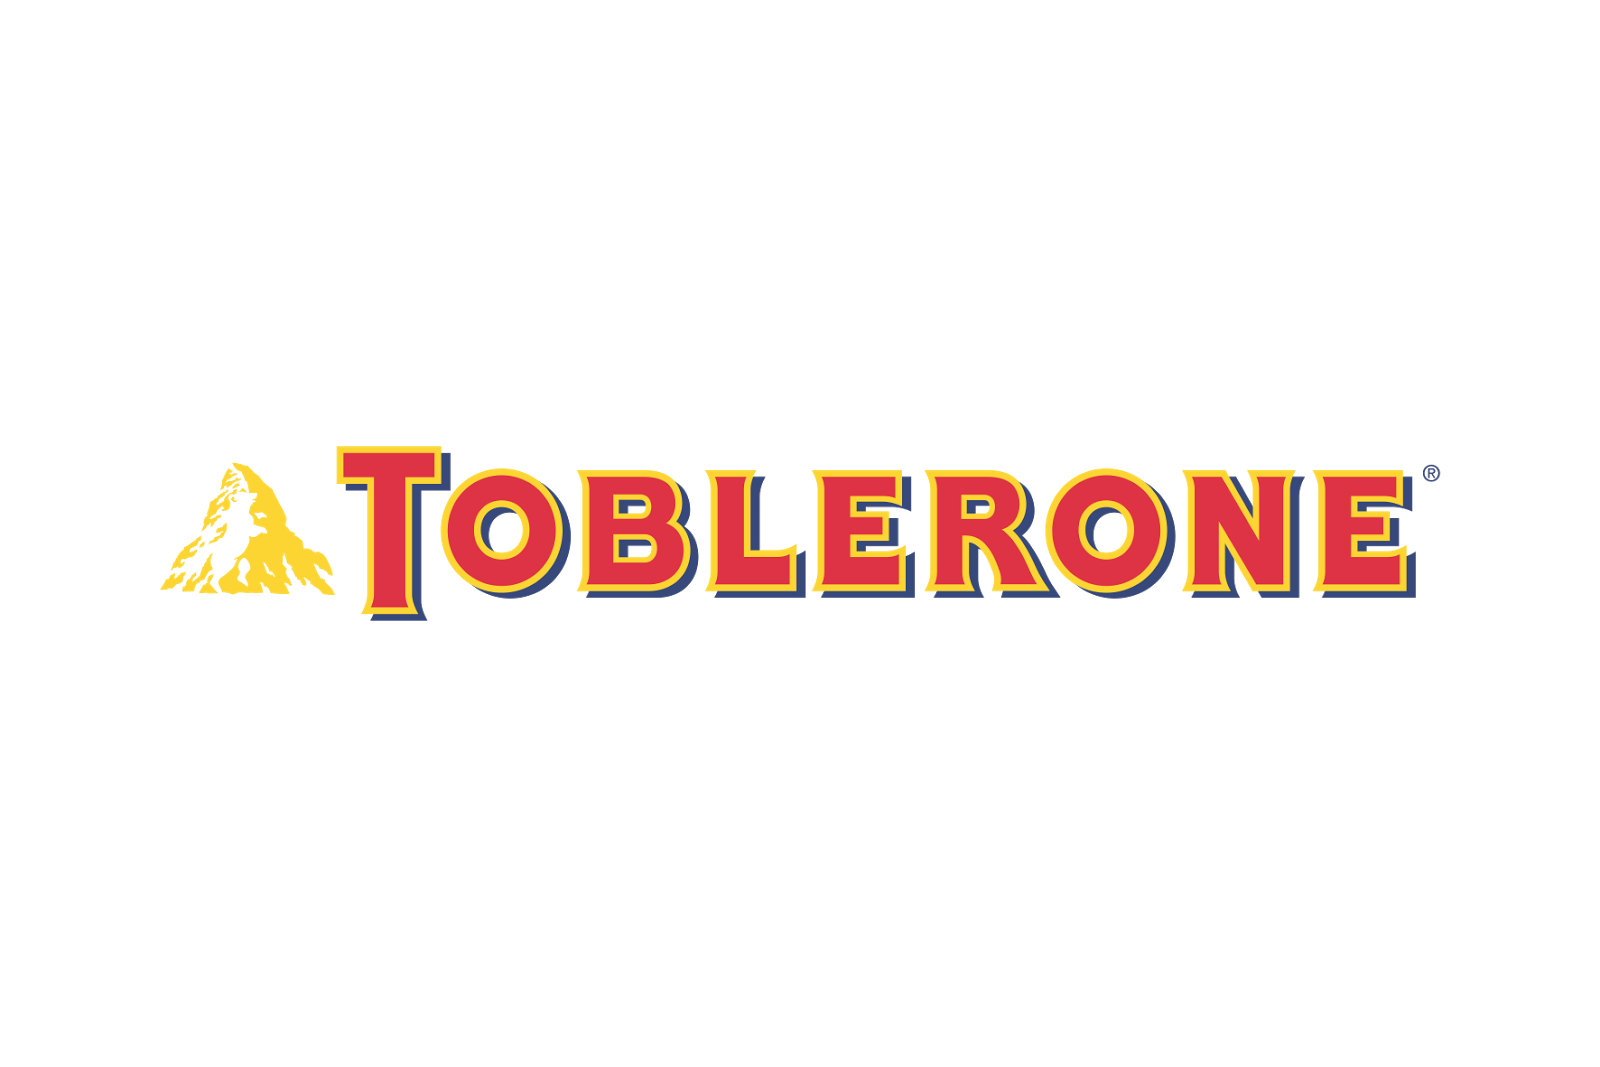 Toblerone Logo Wallpaper